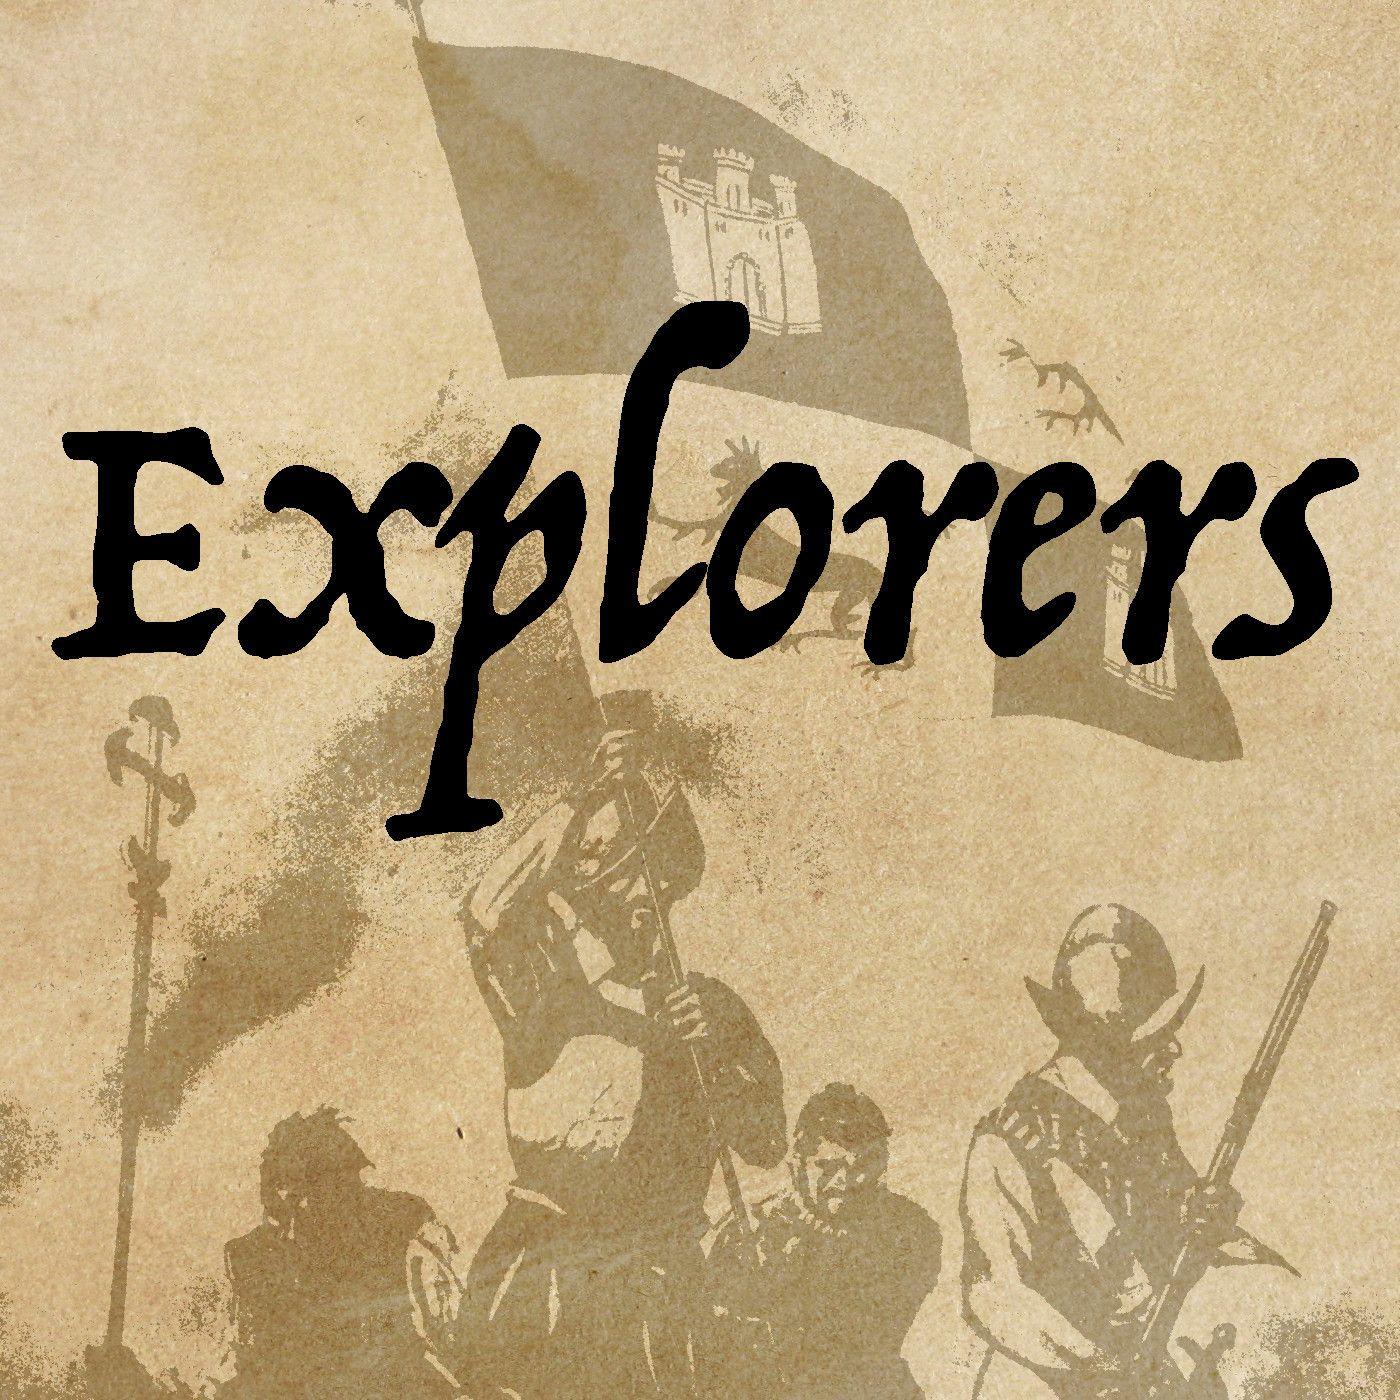 Christopher Columbus - Part 5